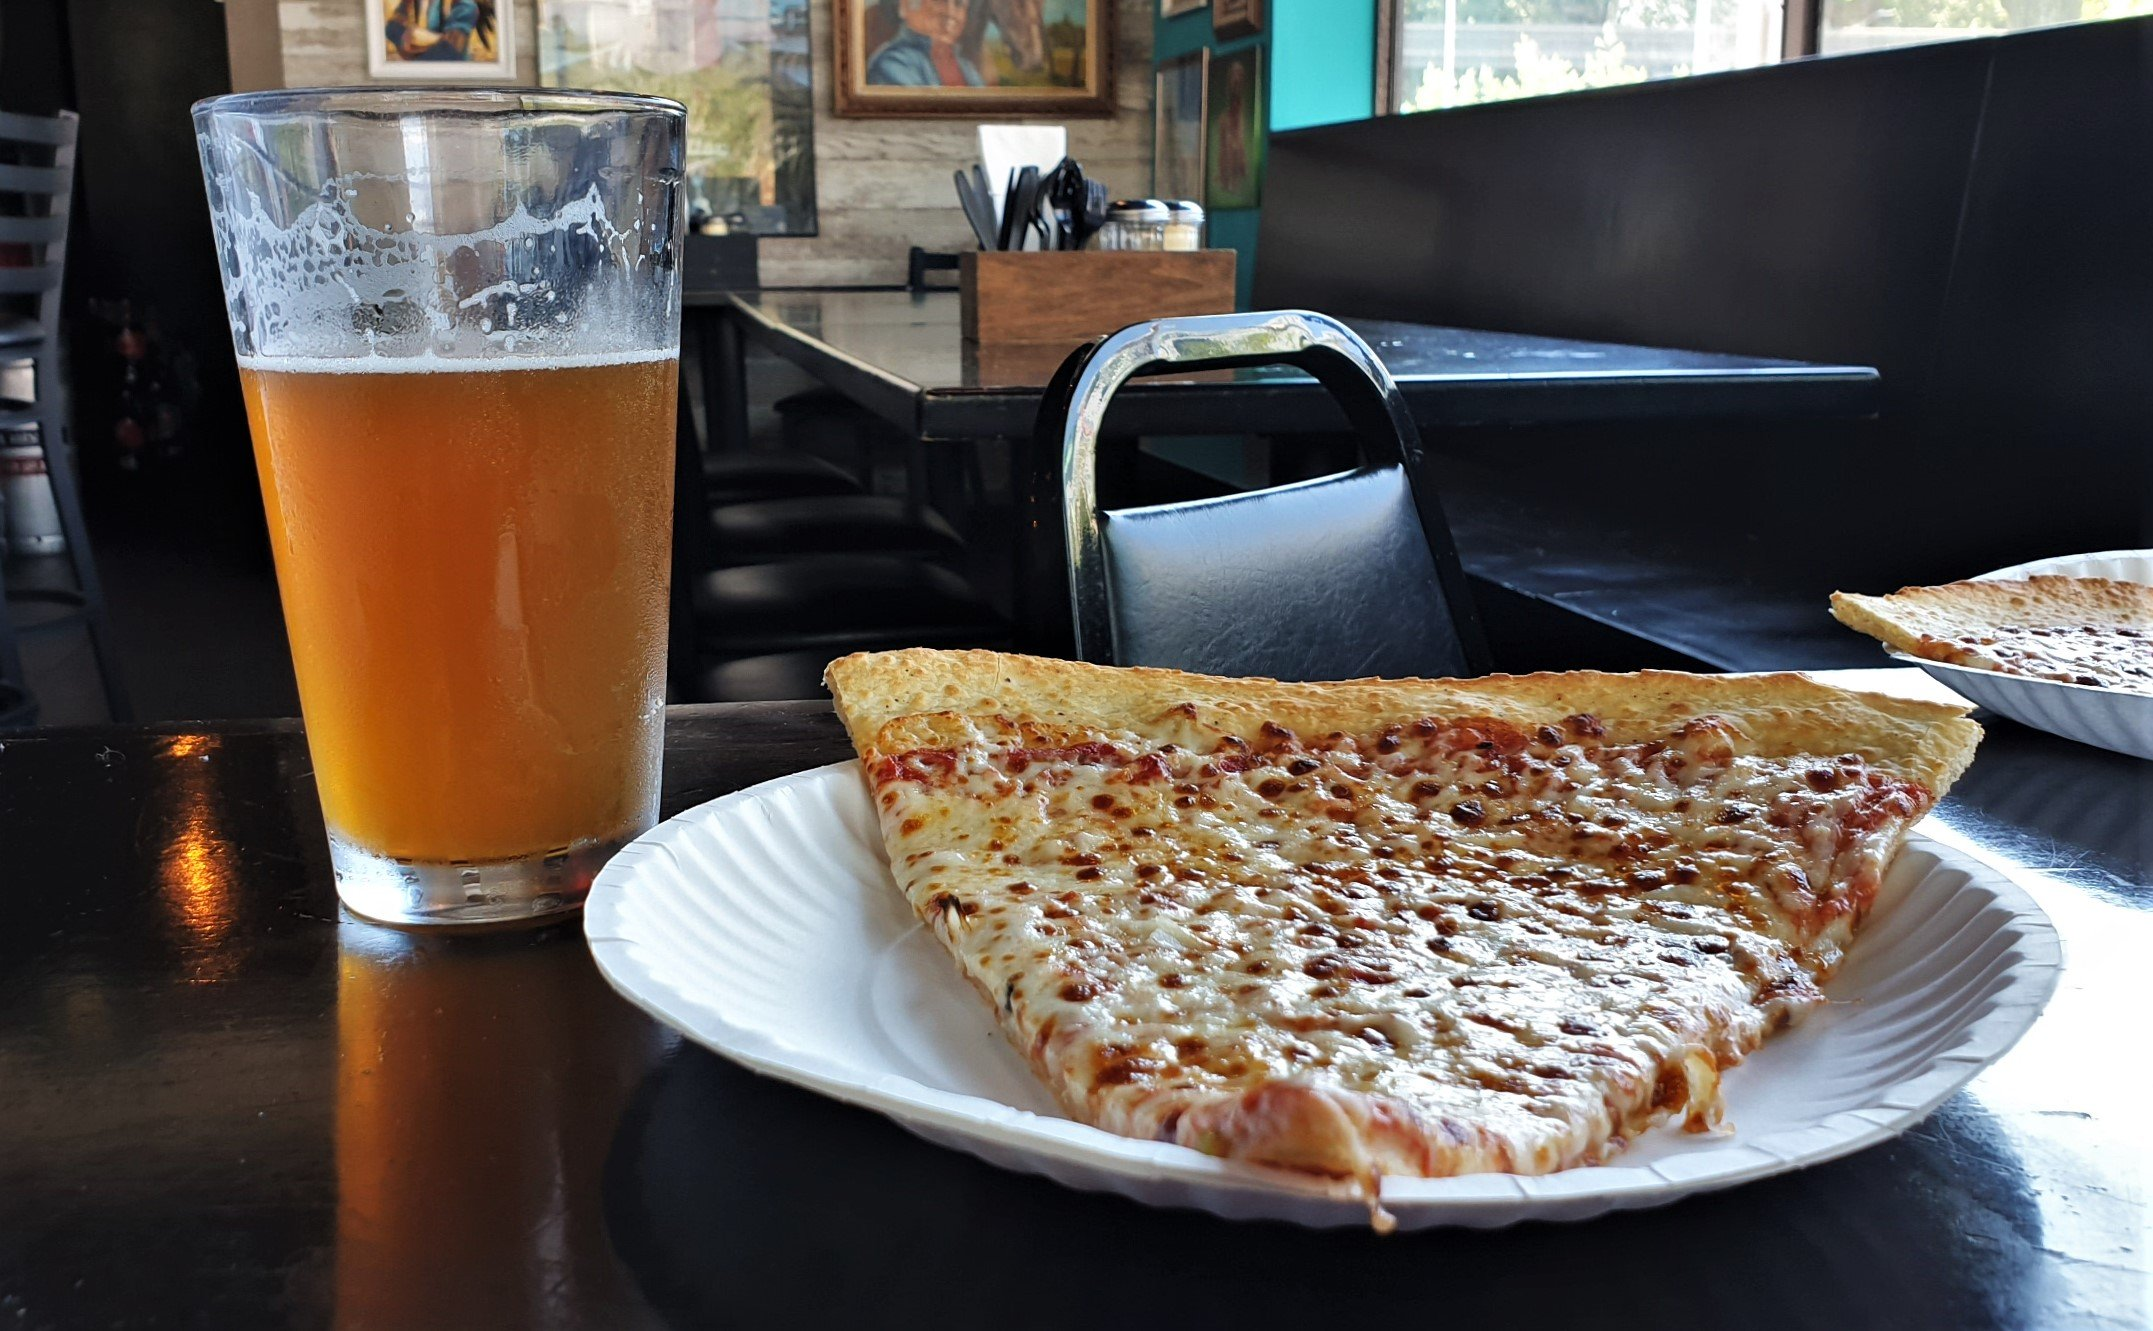 La pizza di Dan